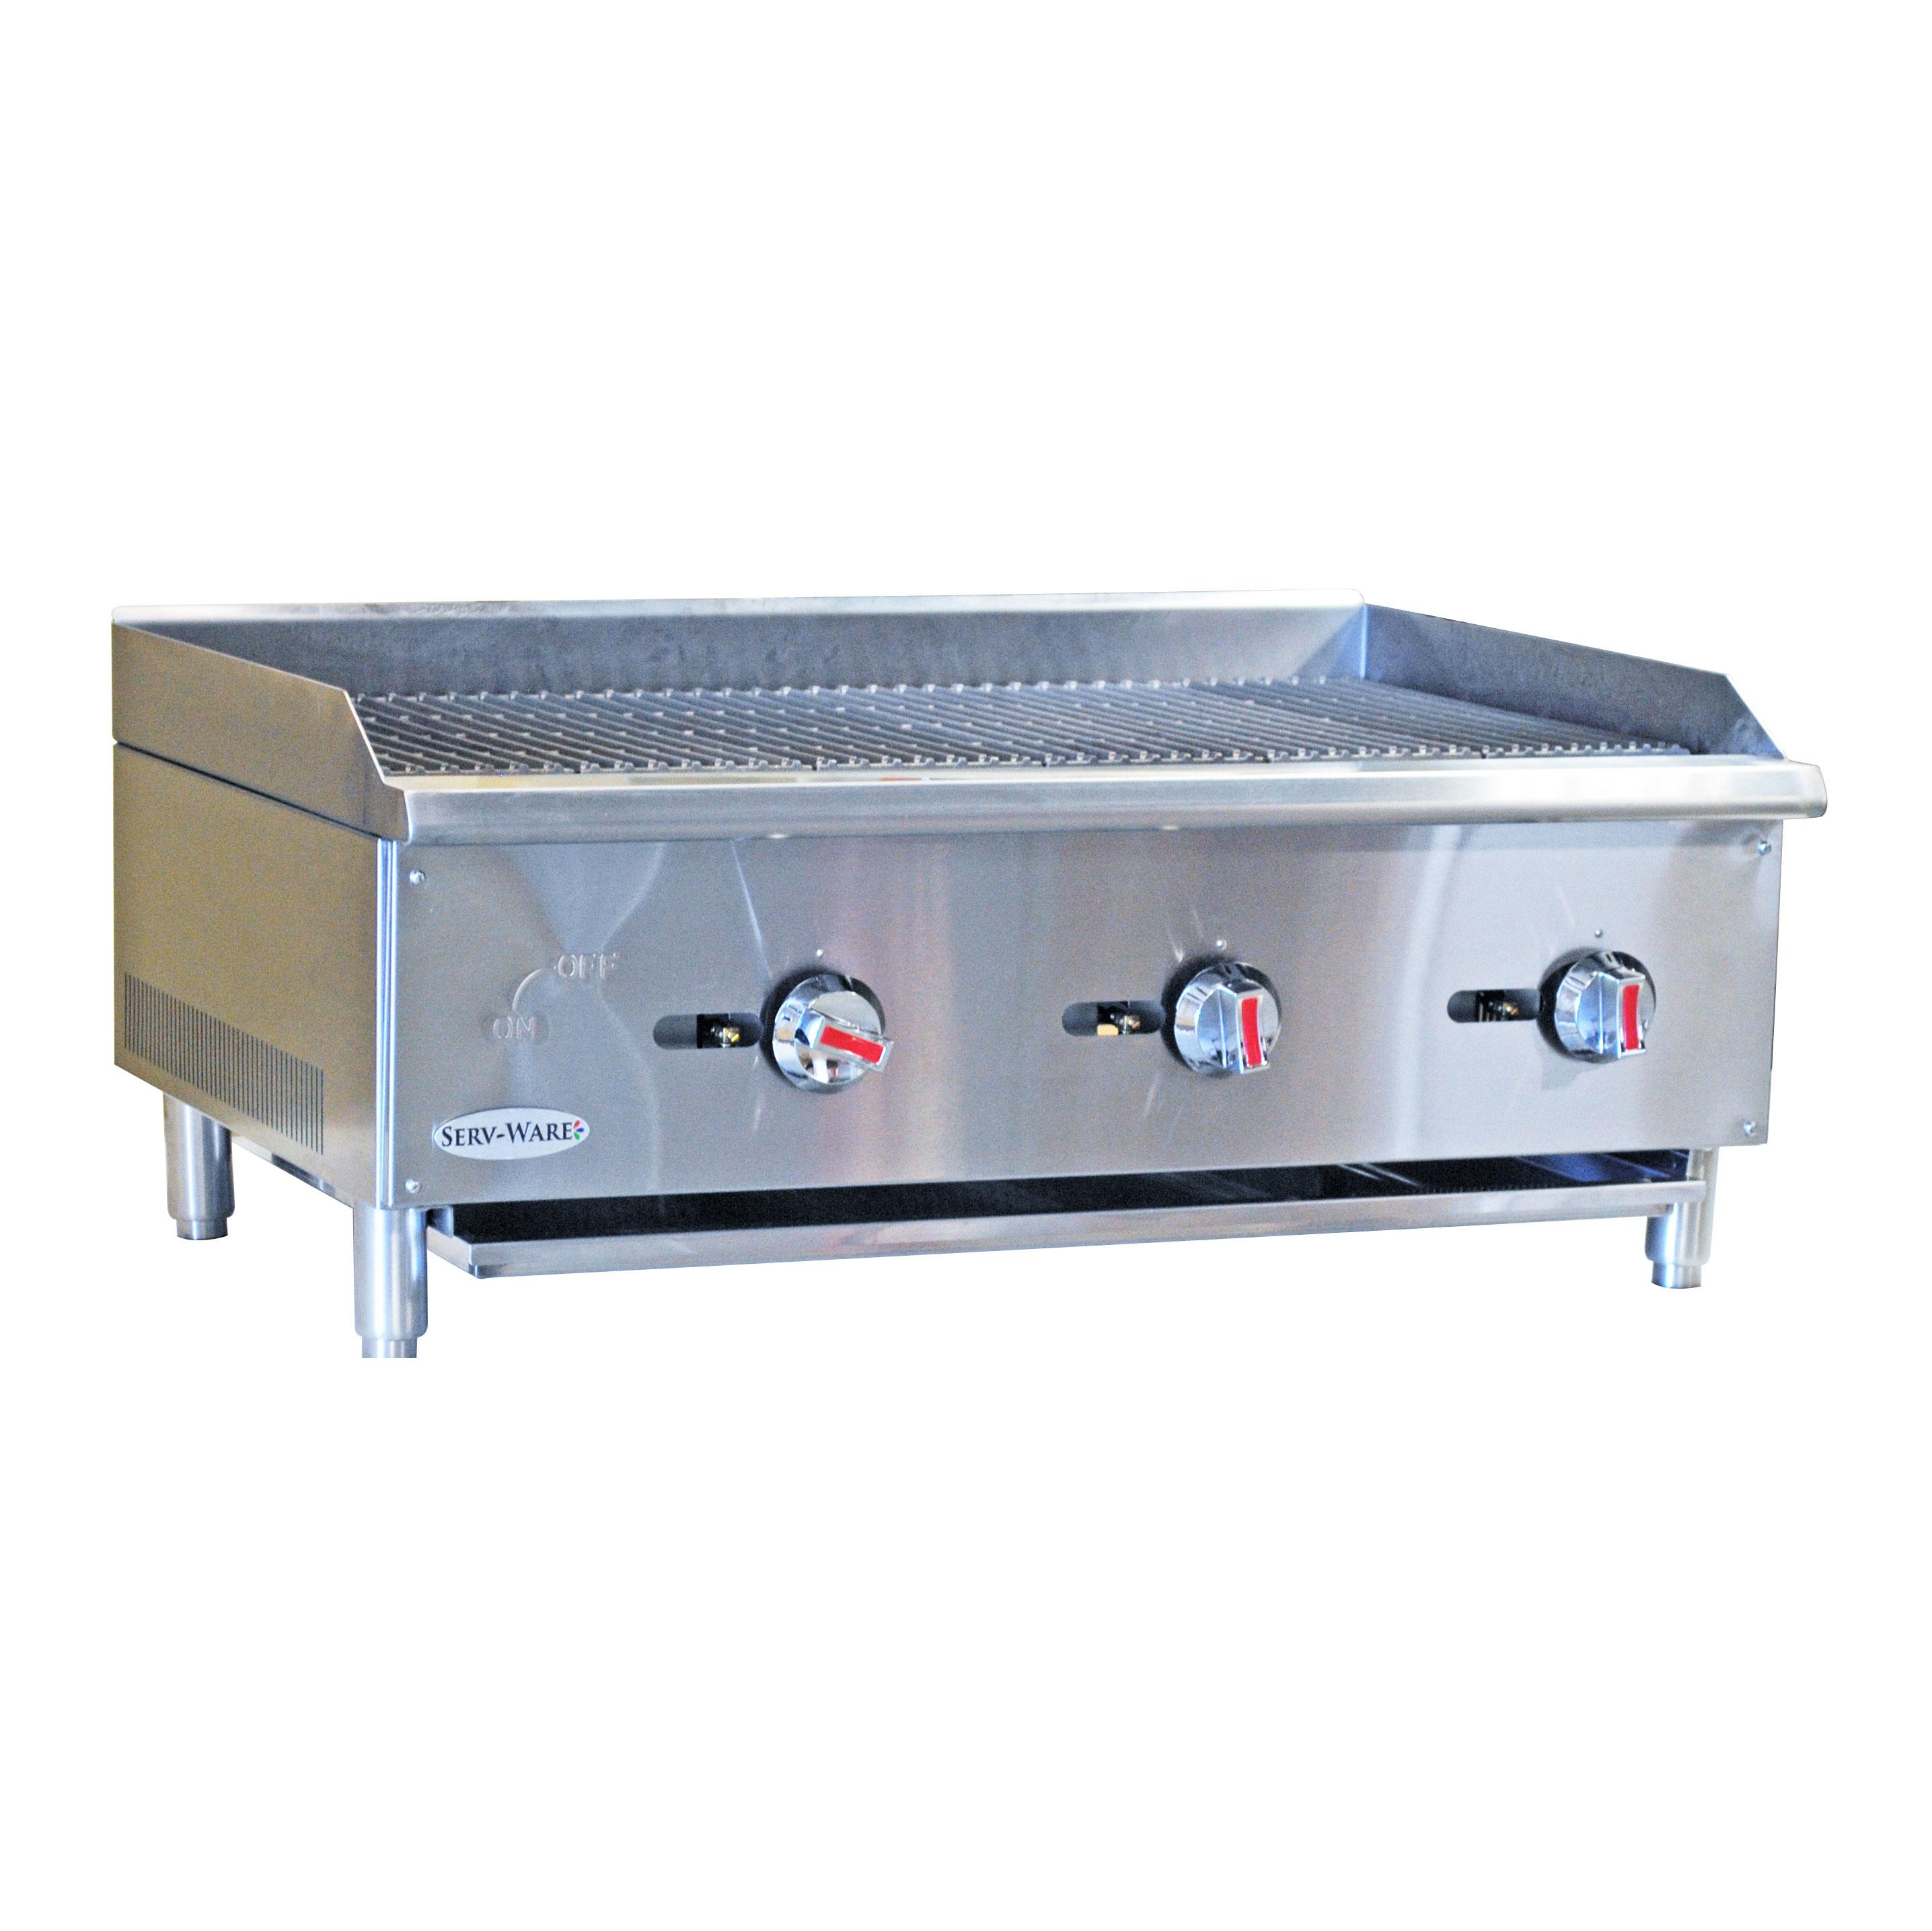 Serv-Ware SCBS-36 charbroiler, gas, countertop